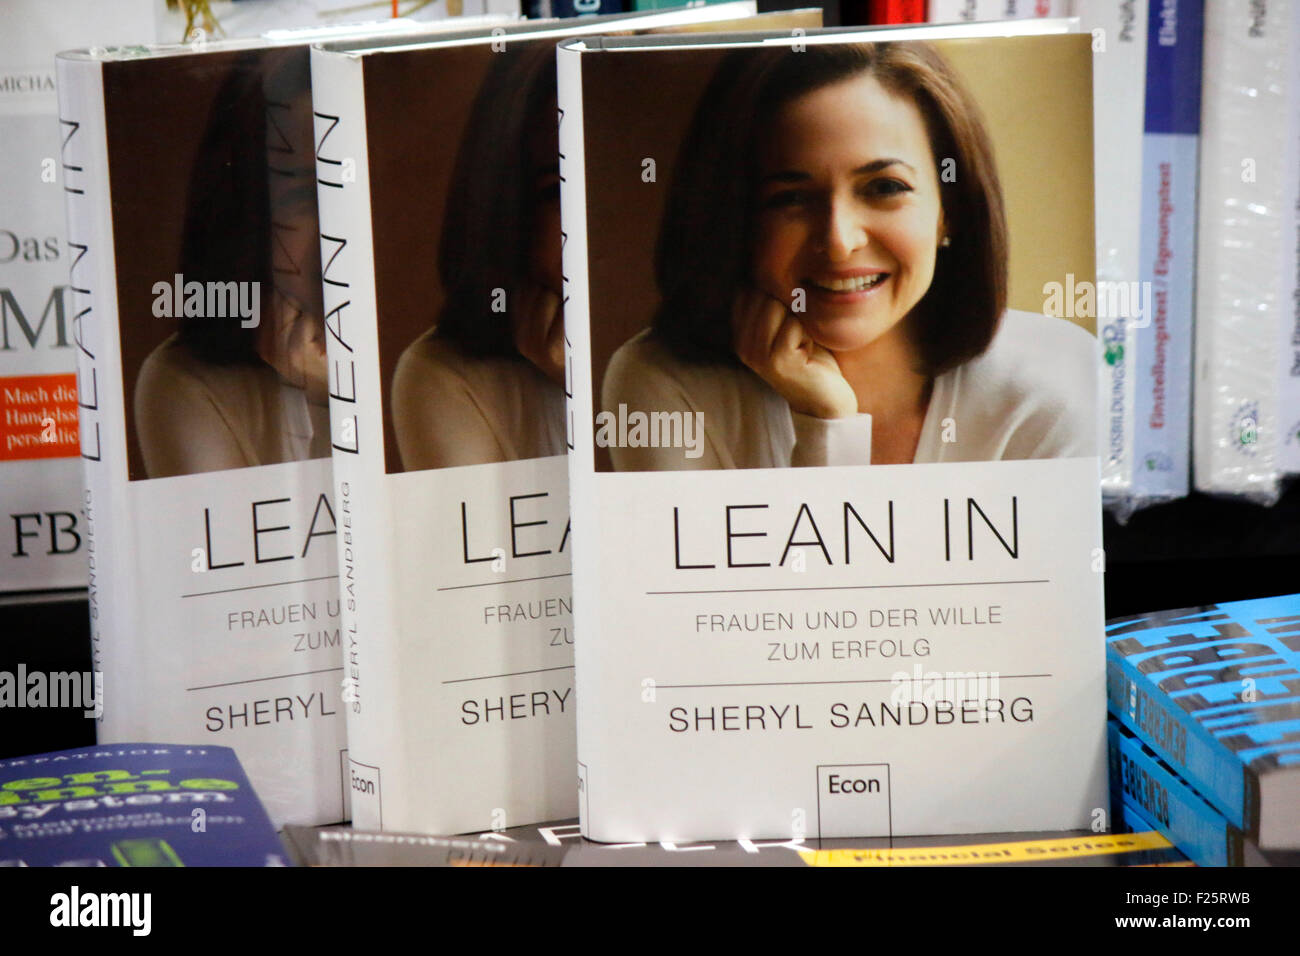 Buch der Facebook Managerin Sheryl Sandberg 'Lean In', Berlin. - Stock Image